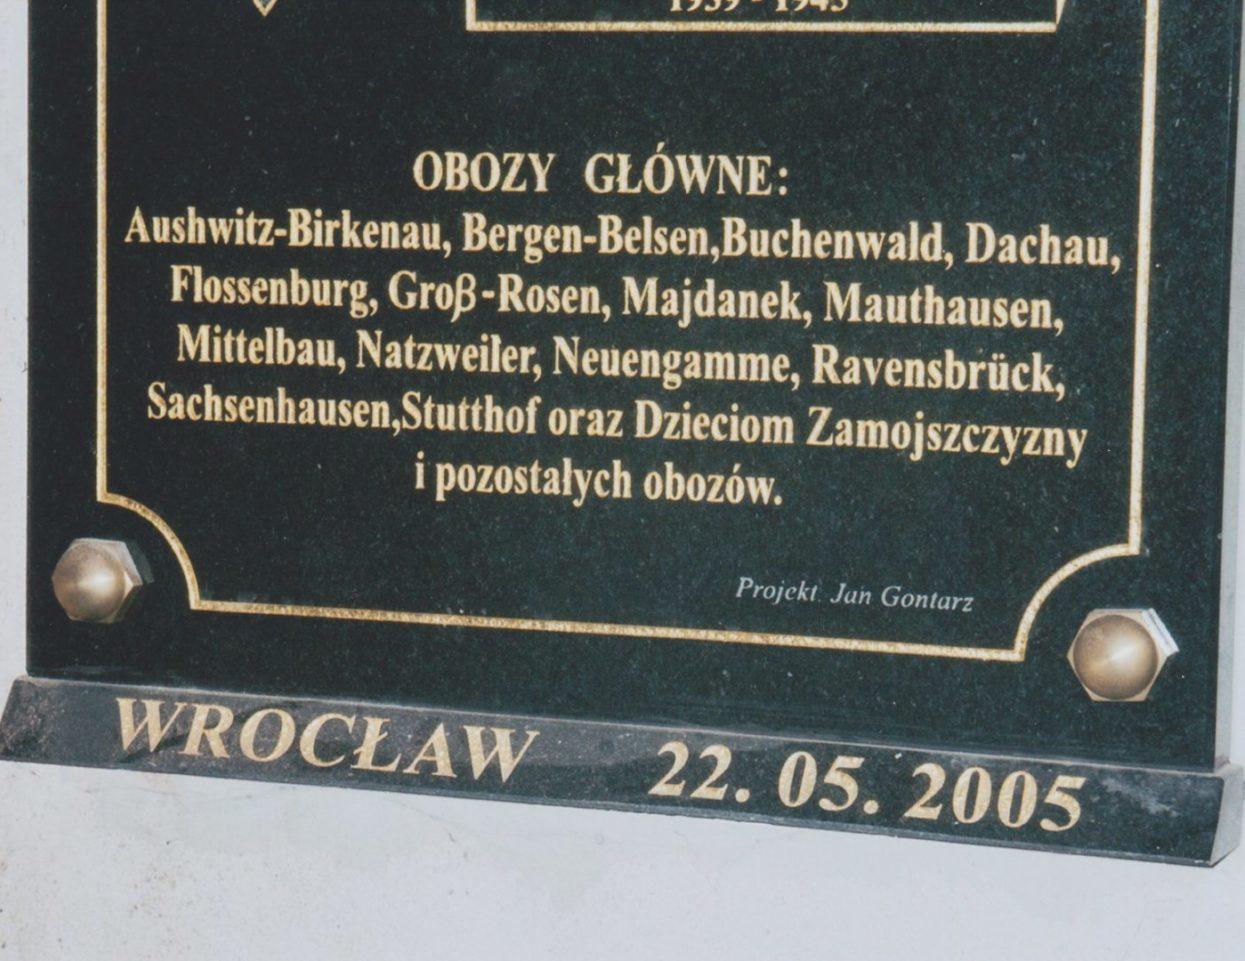 Wroclaw st elisabeth kirche tafel detail